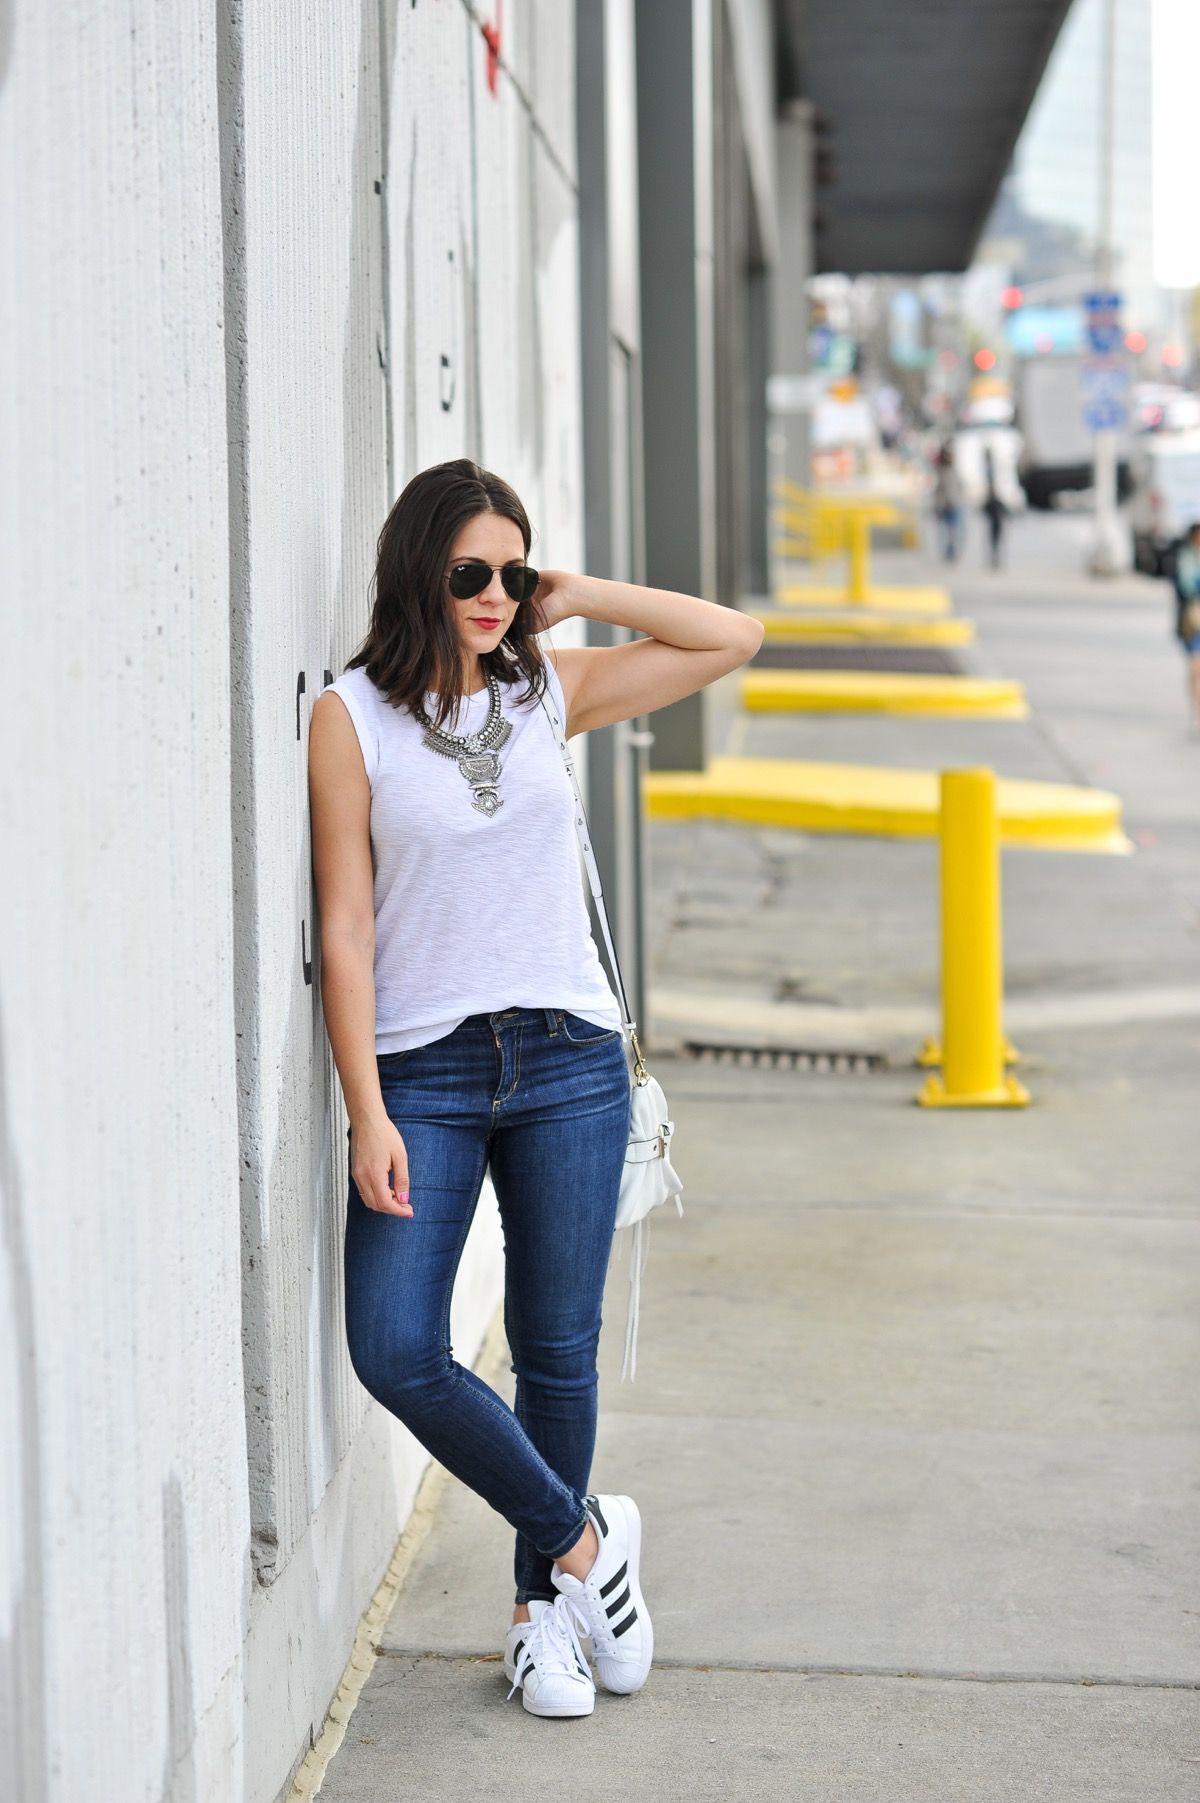 adidas originals, street style, My Style Vita - @mystylevita - 22